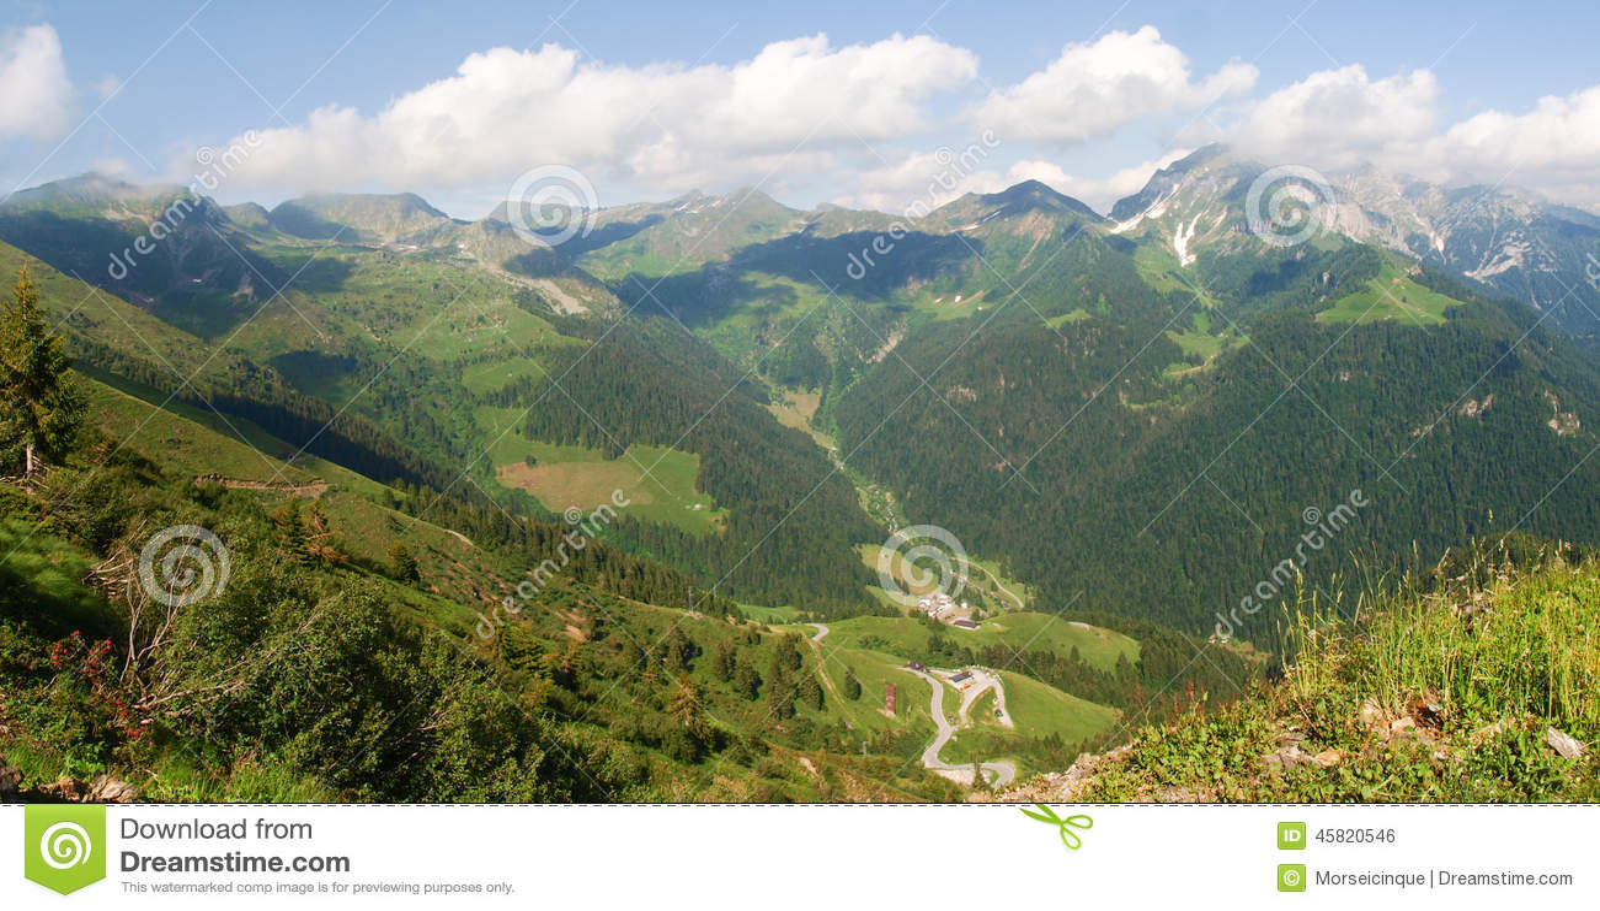 Val Brembana, direction of Passo San Marco